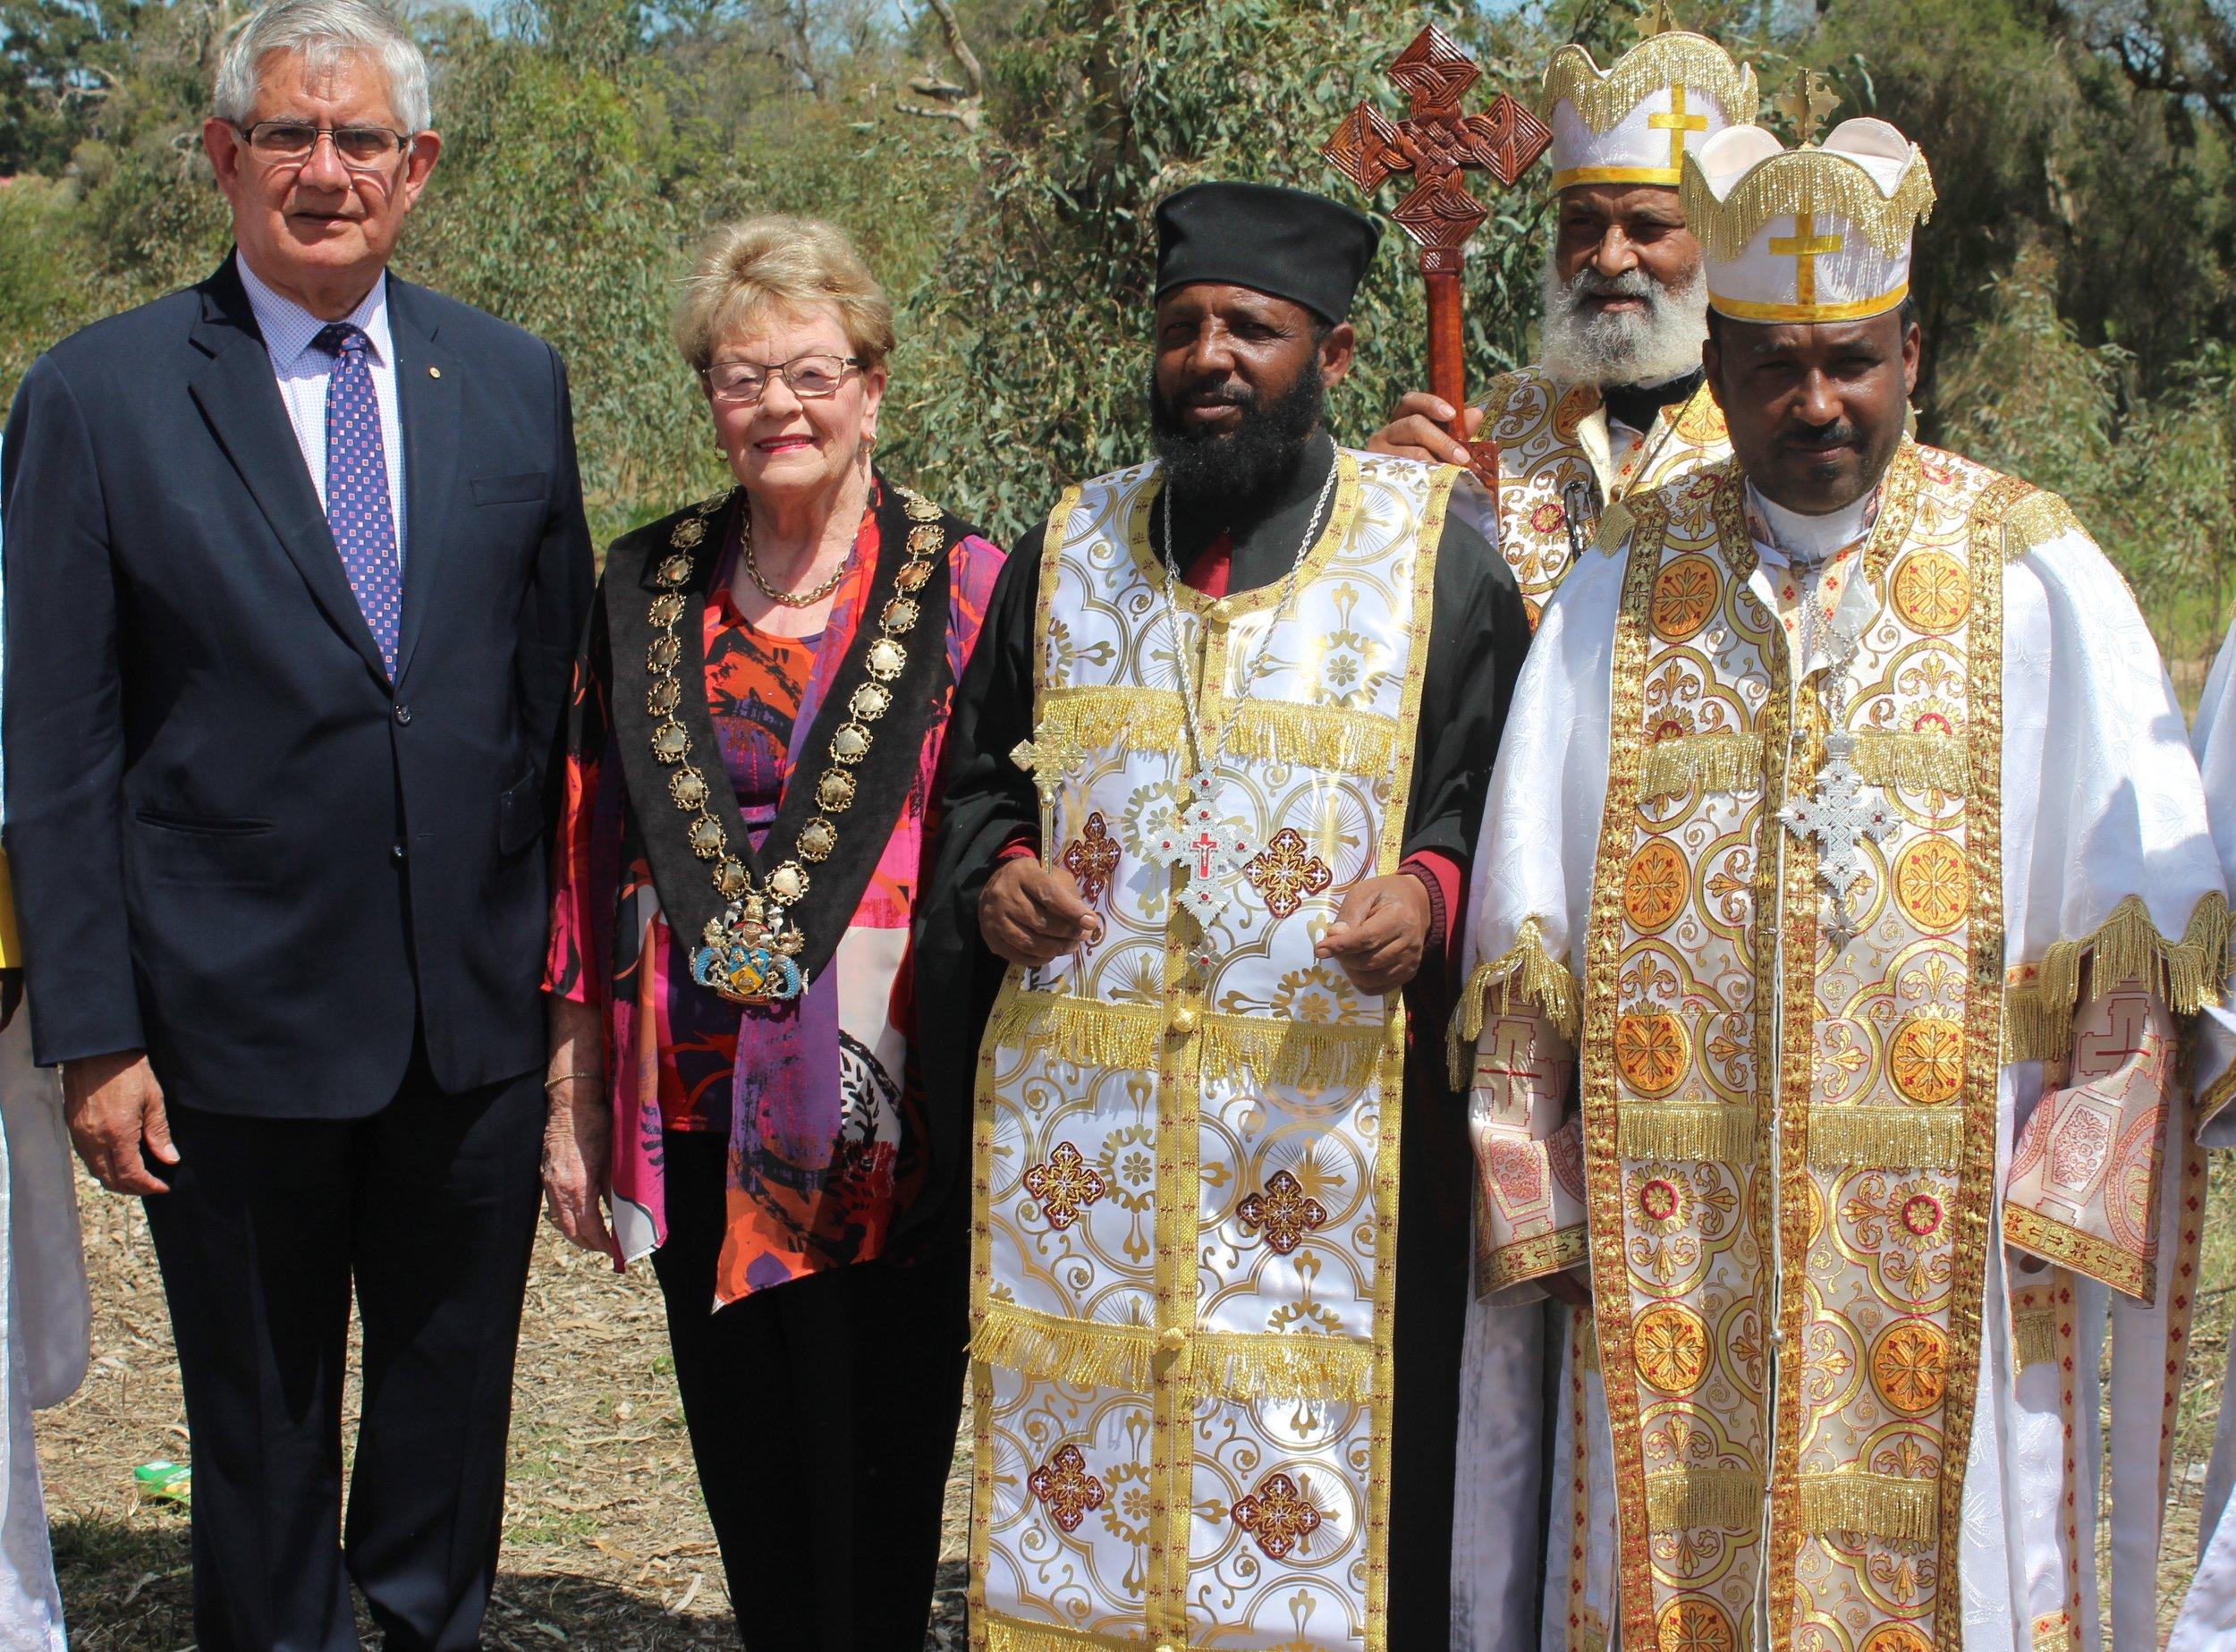 Ethiopian Orthodox Tewahedo Debre Amin Abune Teklehaimanot Church Inc., Kenwick -